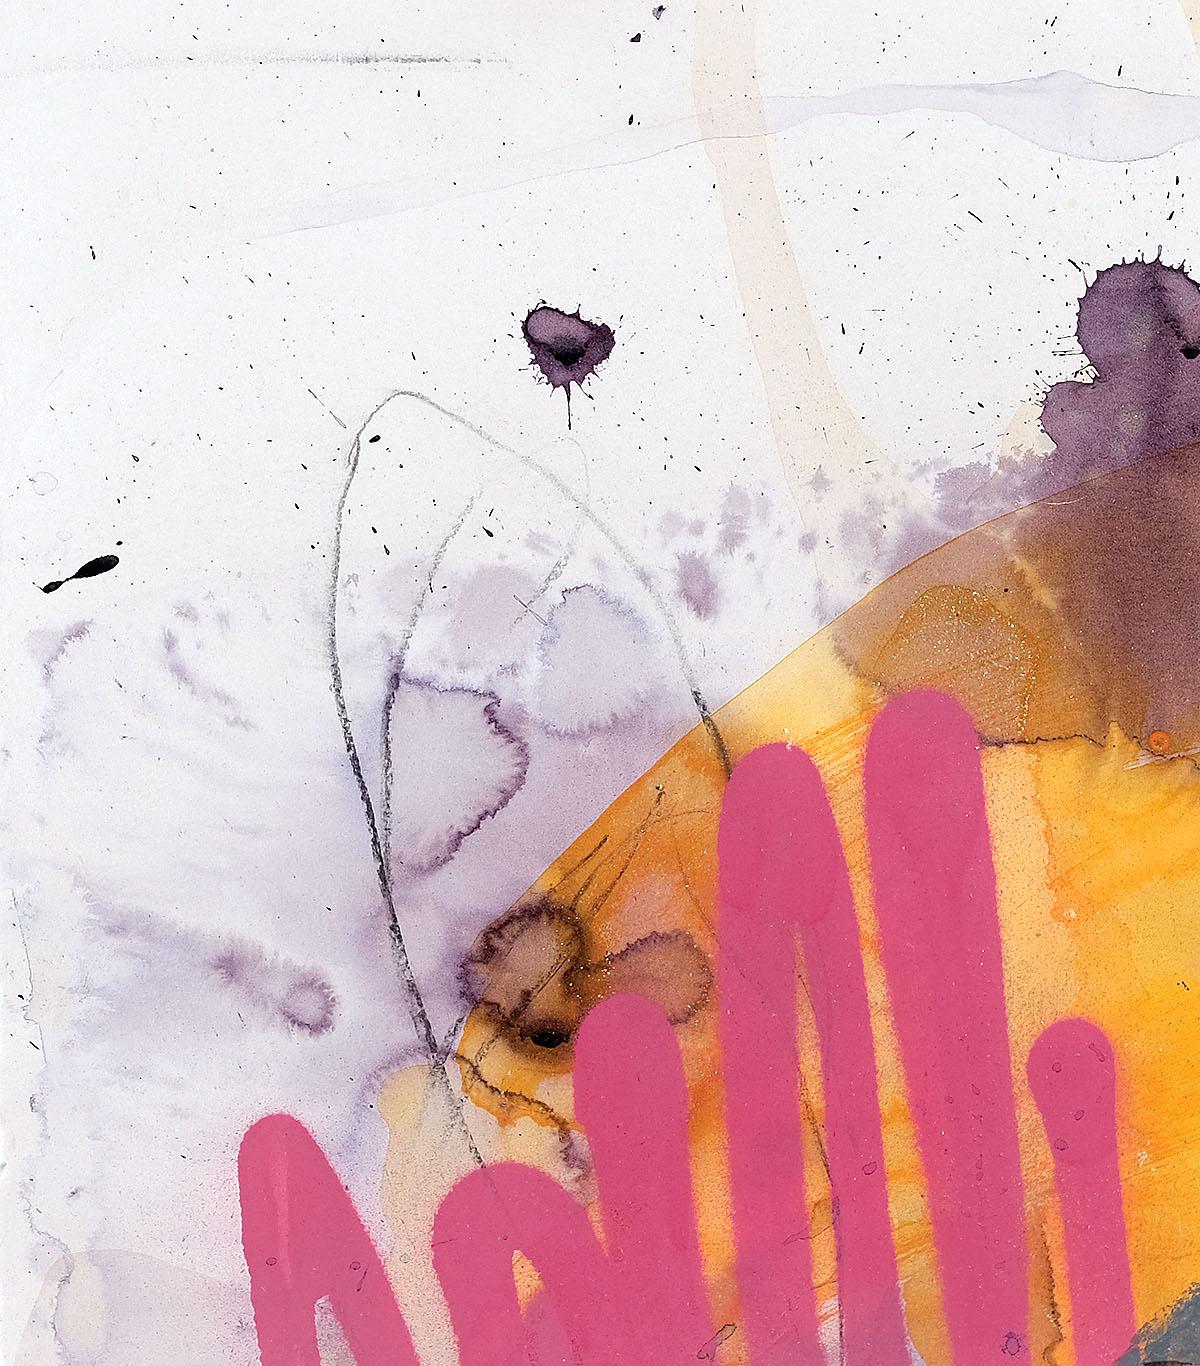 Isla Valentine Wade - My Passion is Dead, watercolour